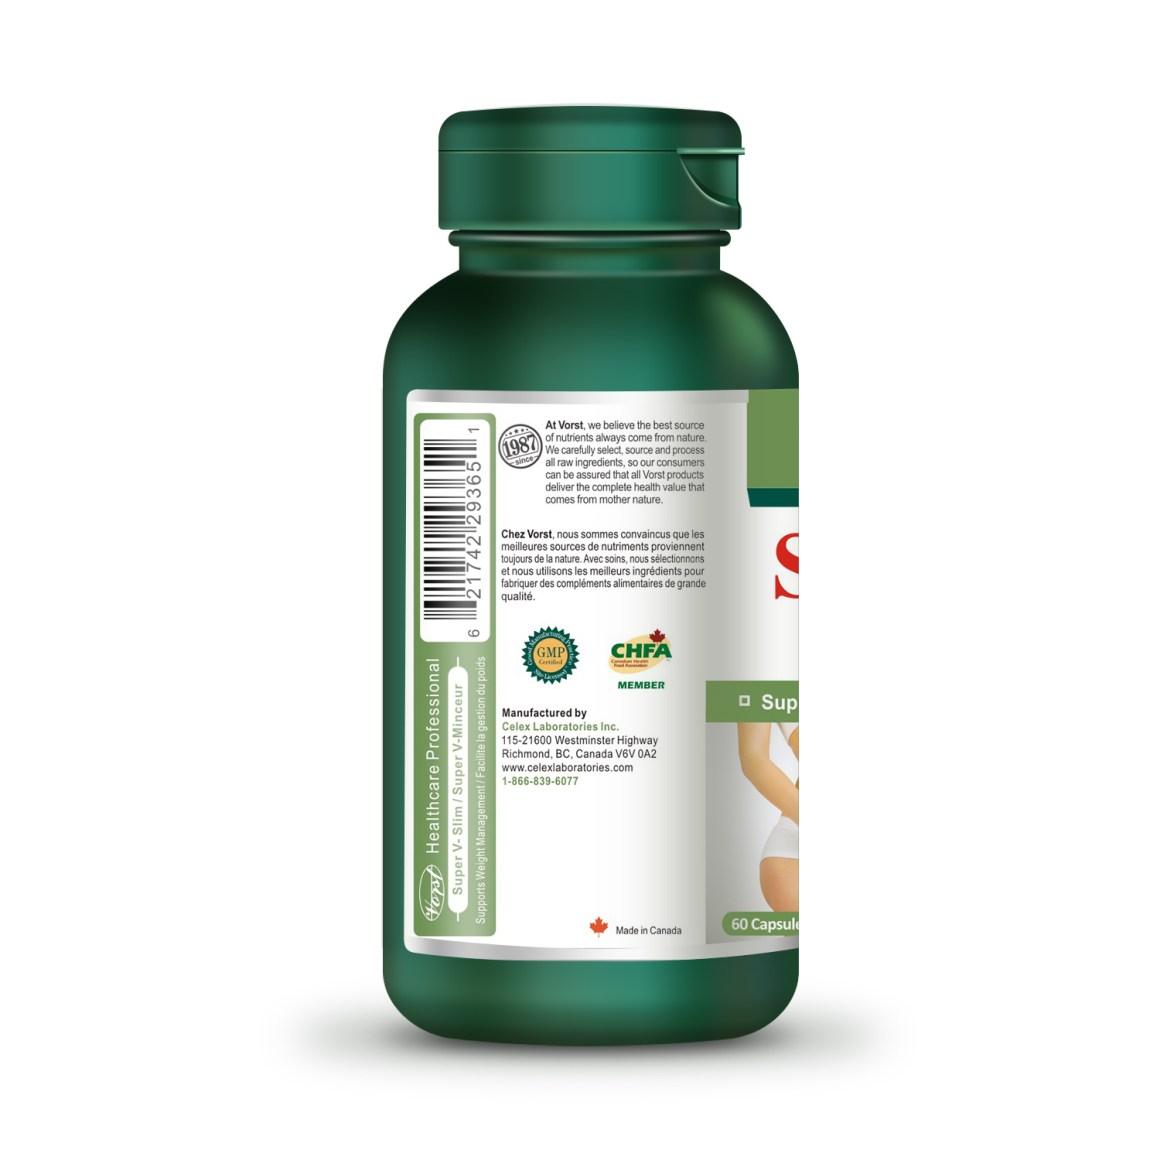 Super V Slim Celex Laboratories Inc Dietary Supplements